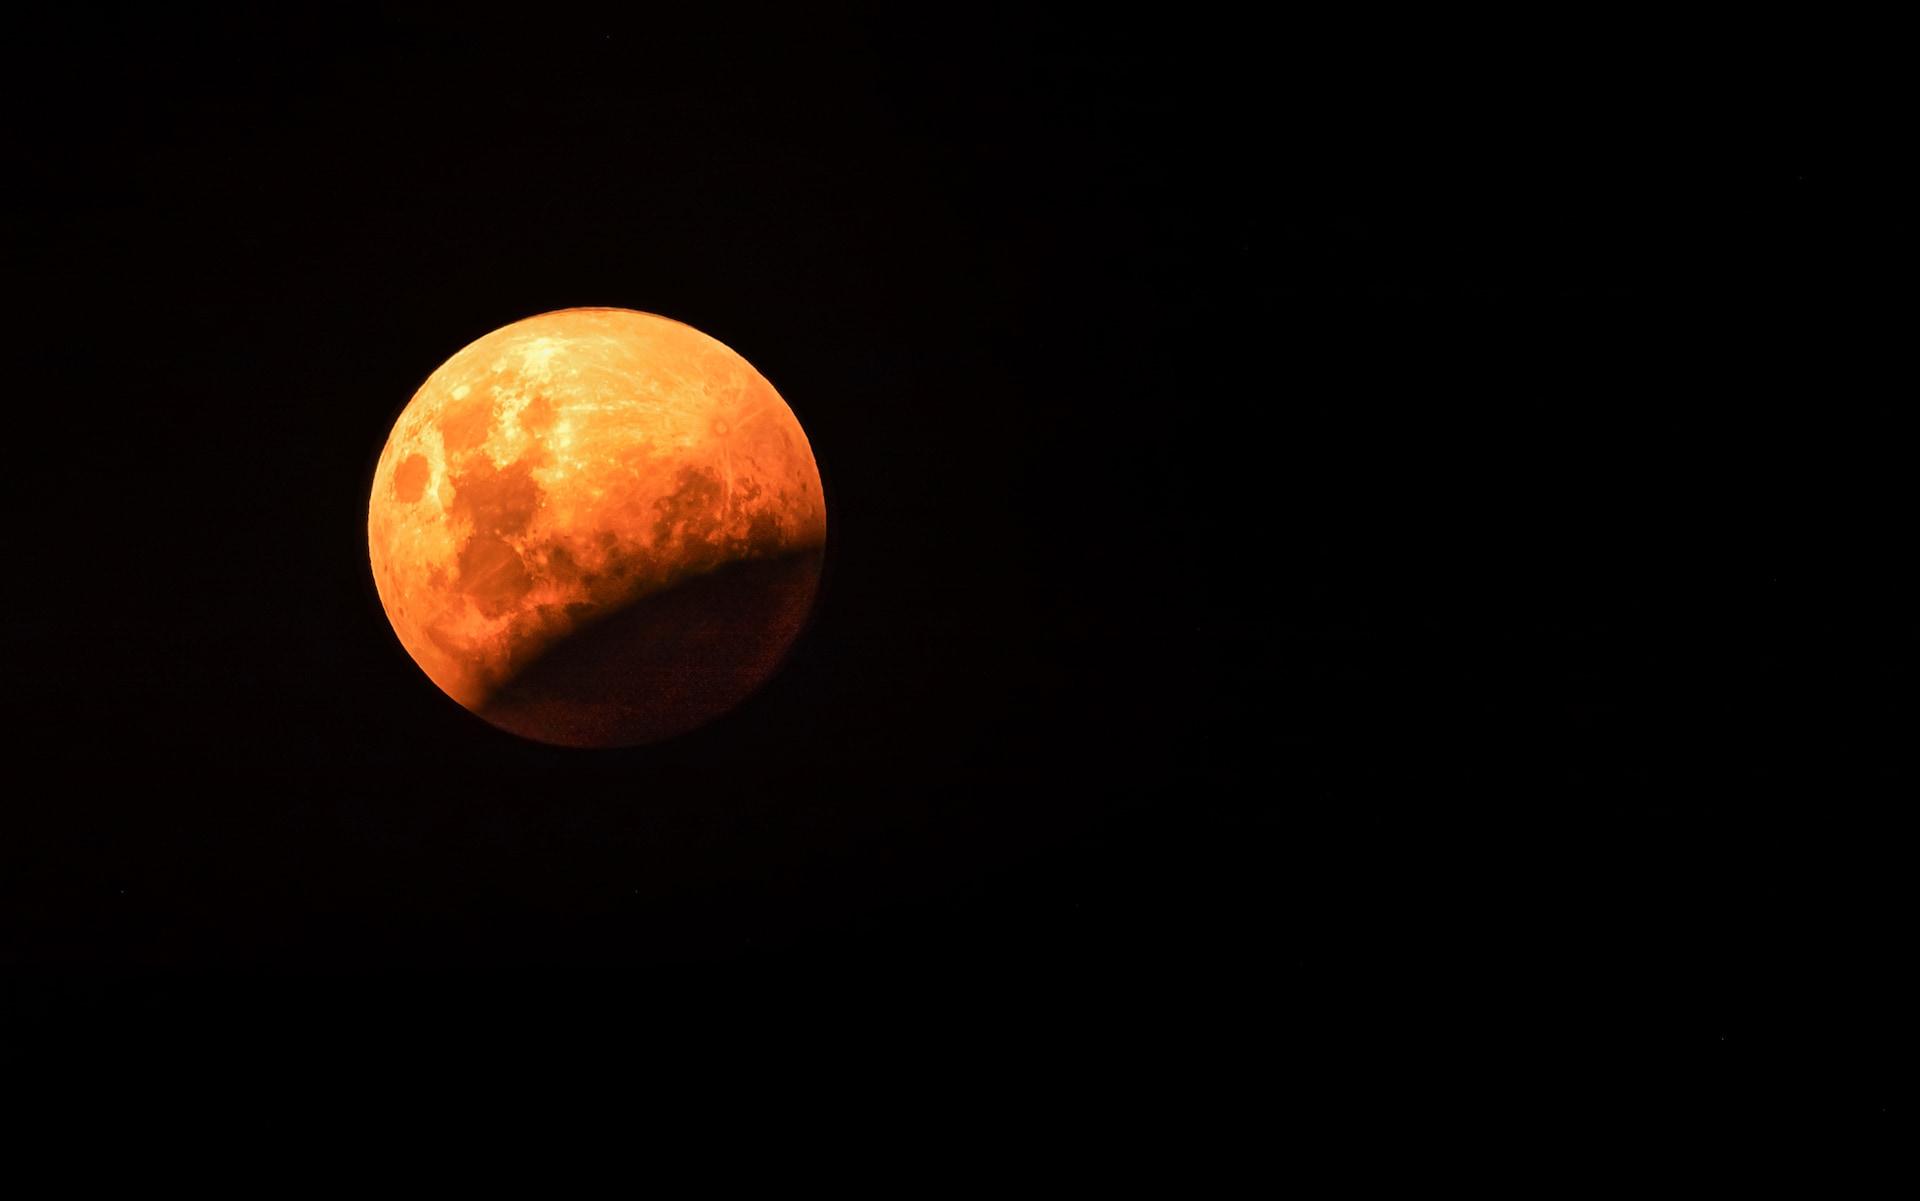 lunar-eclipse-GettyImages-930083724